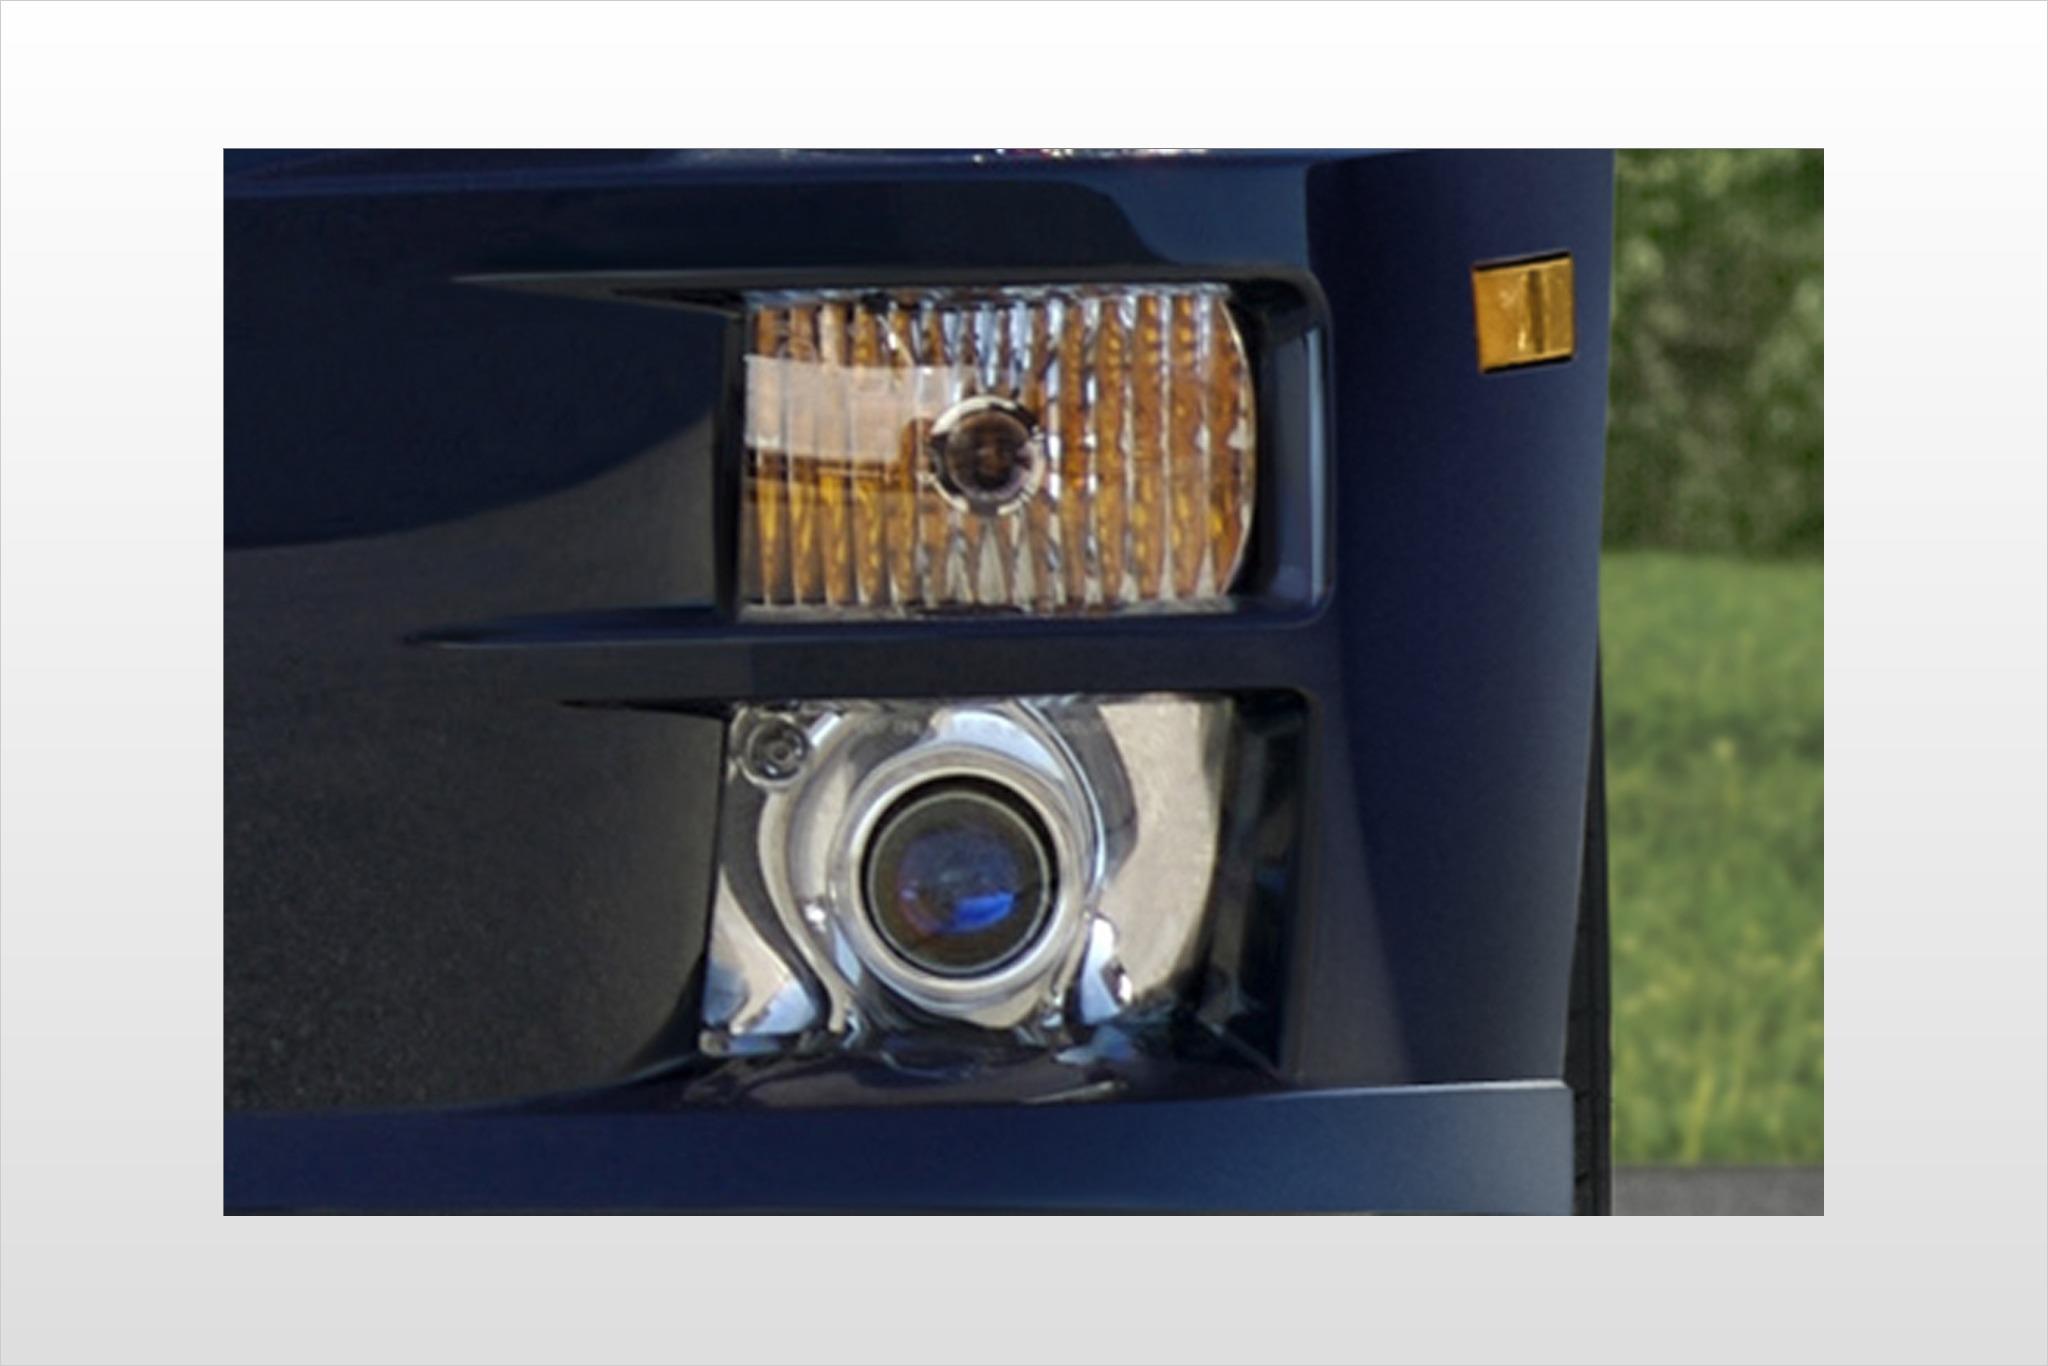 2008 cadillac sts sedan v8 luxury fog oem 1 2048